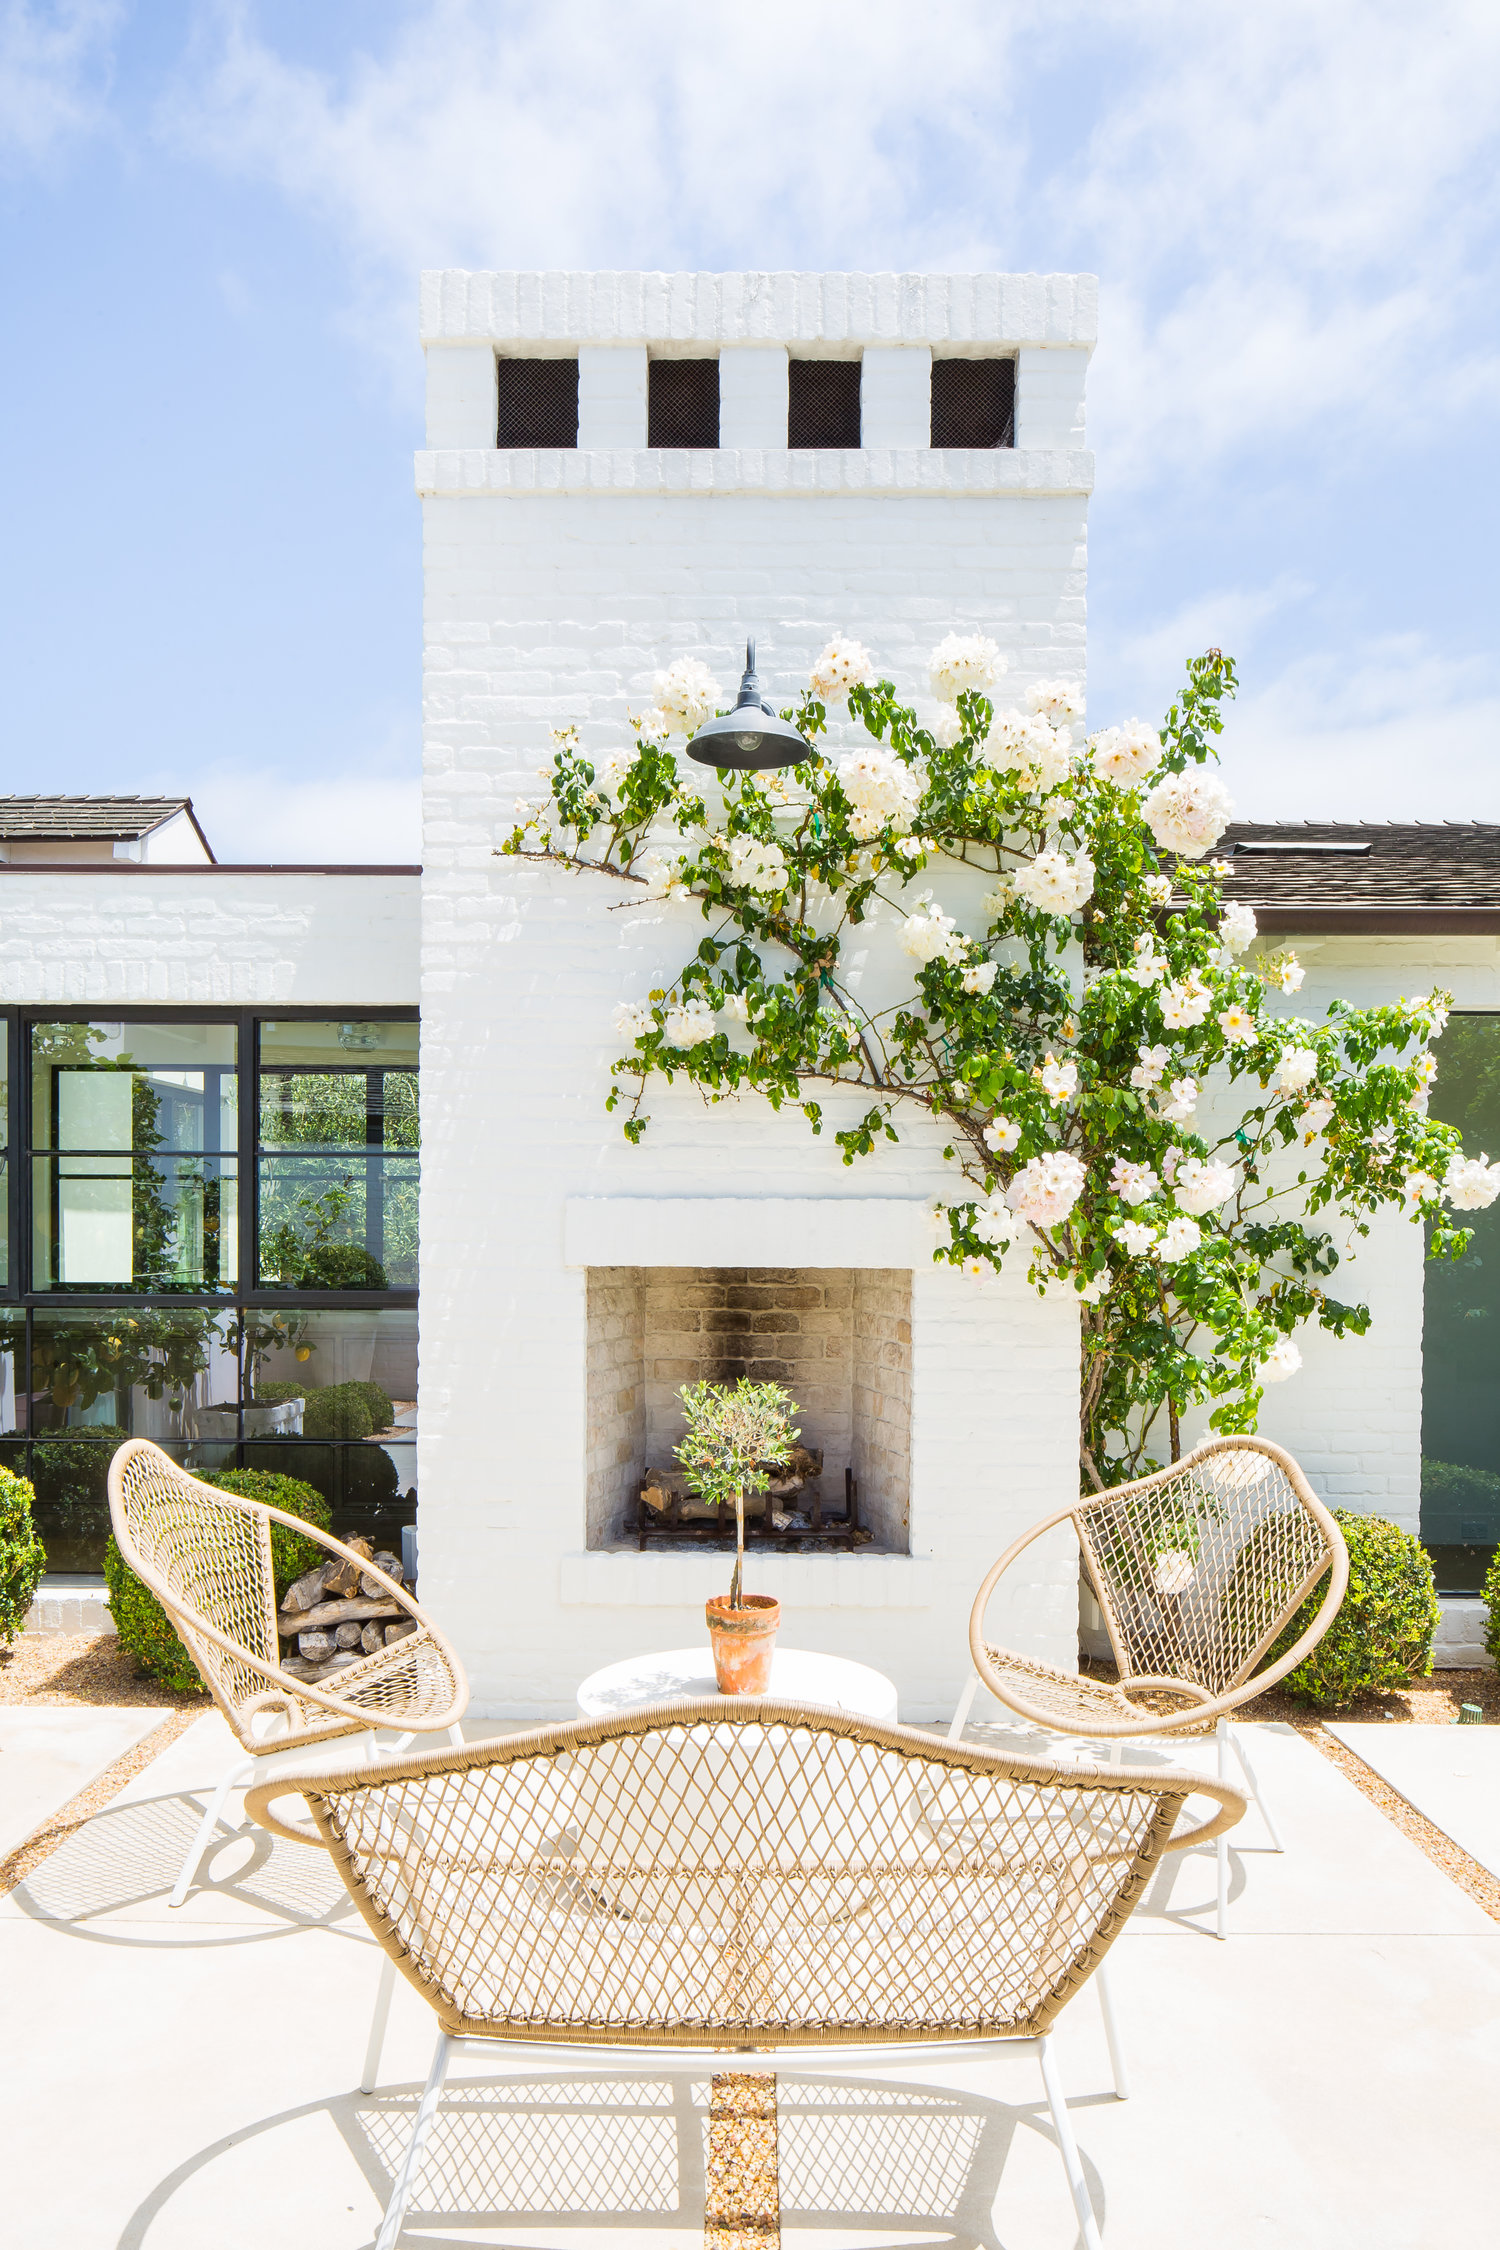 Modern Farmhouse Back Porch with Fireplace - Kelly Nutt Design .jpg